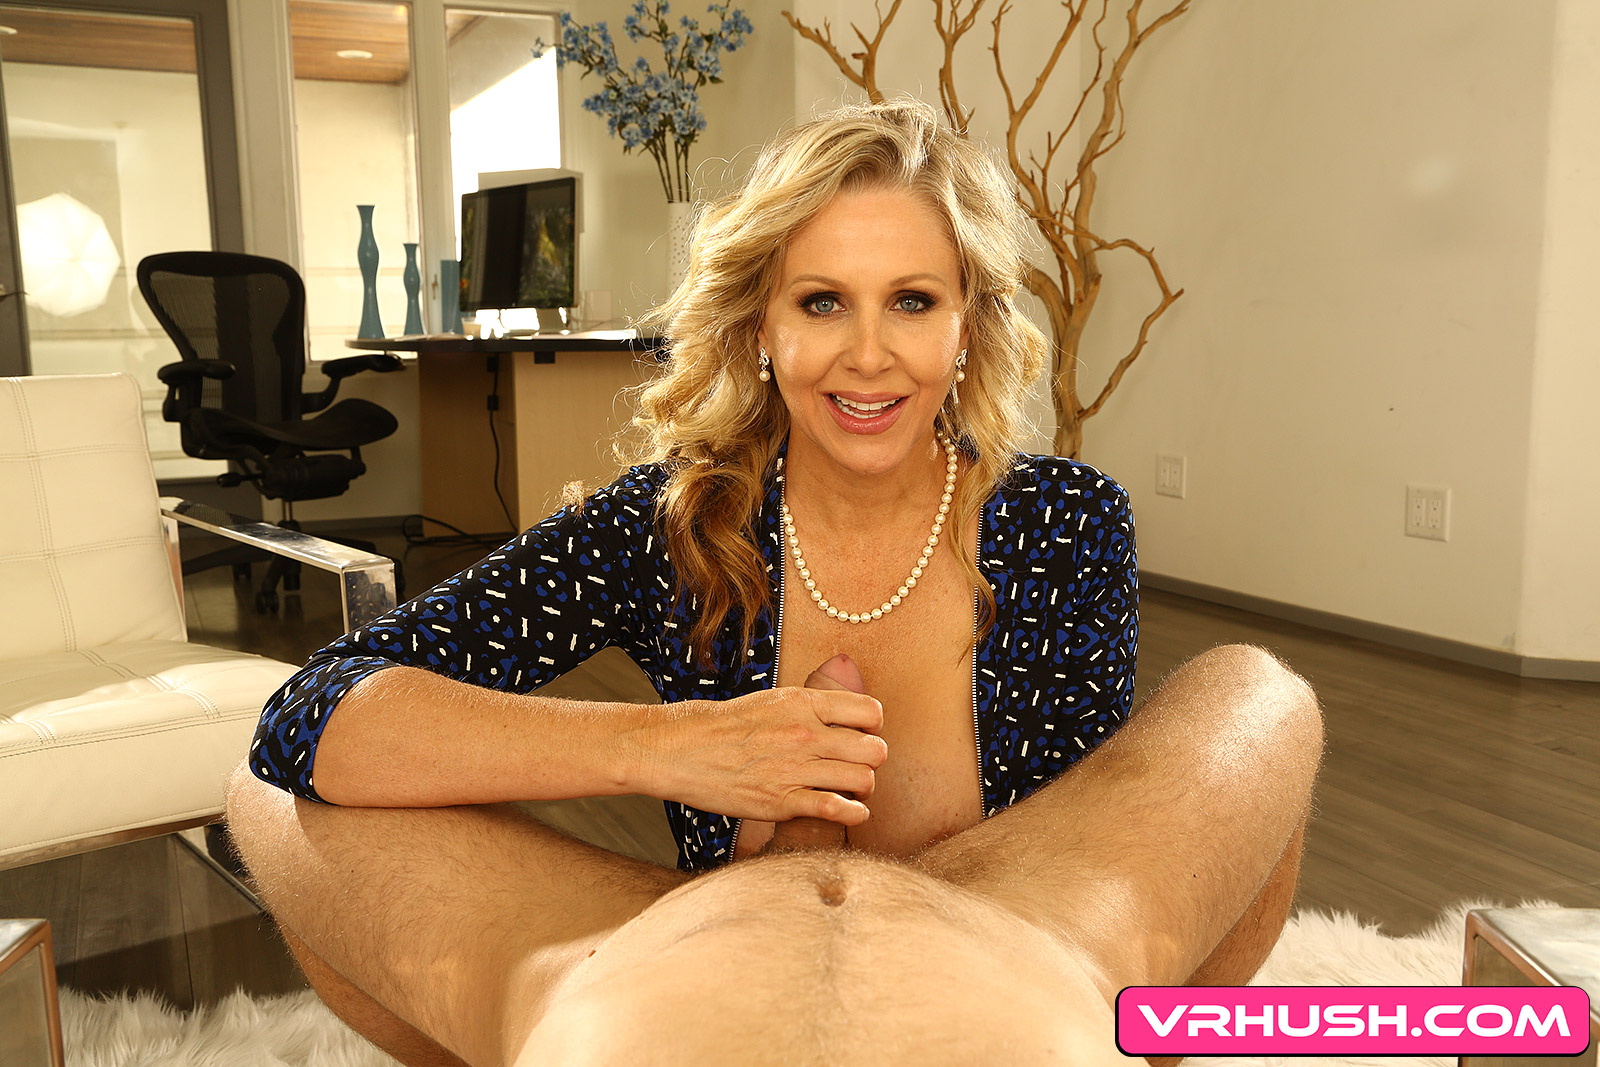 Julia Ann & VRHush | SexLikeReal